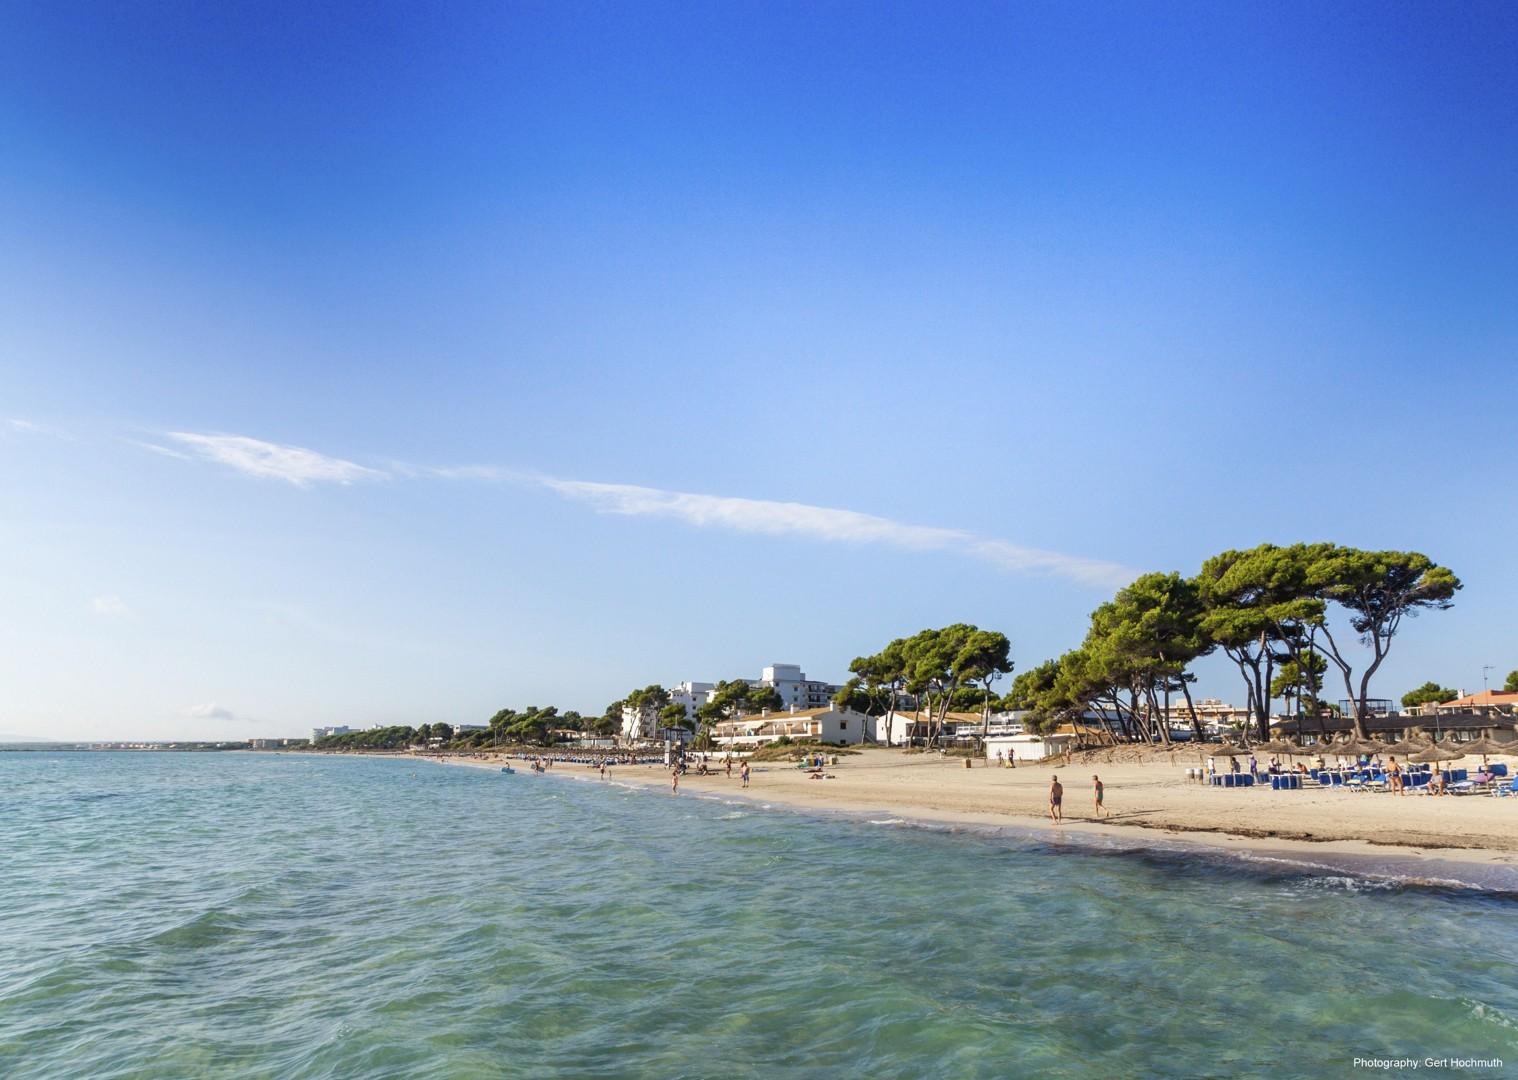 leisure-cycling-holiday-beach-coast-mallorca.jpg - Spain - Mallorca - Self-Guided Leisure Cycling Holiday - Leisure Cycling